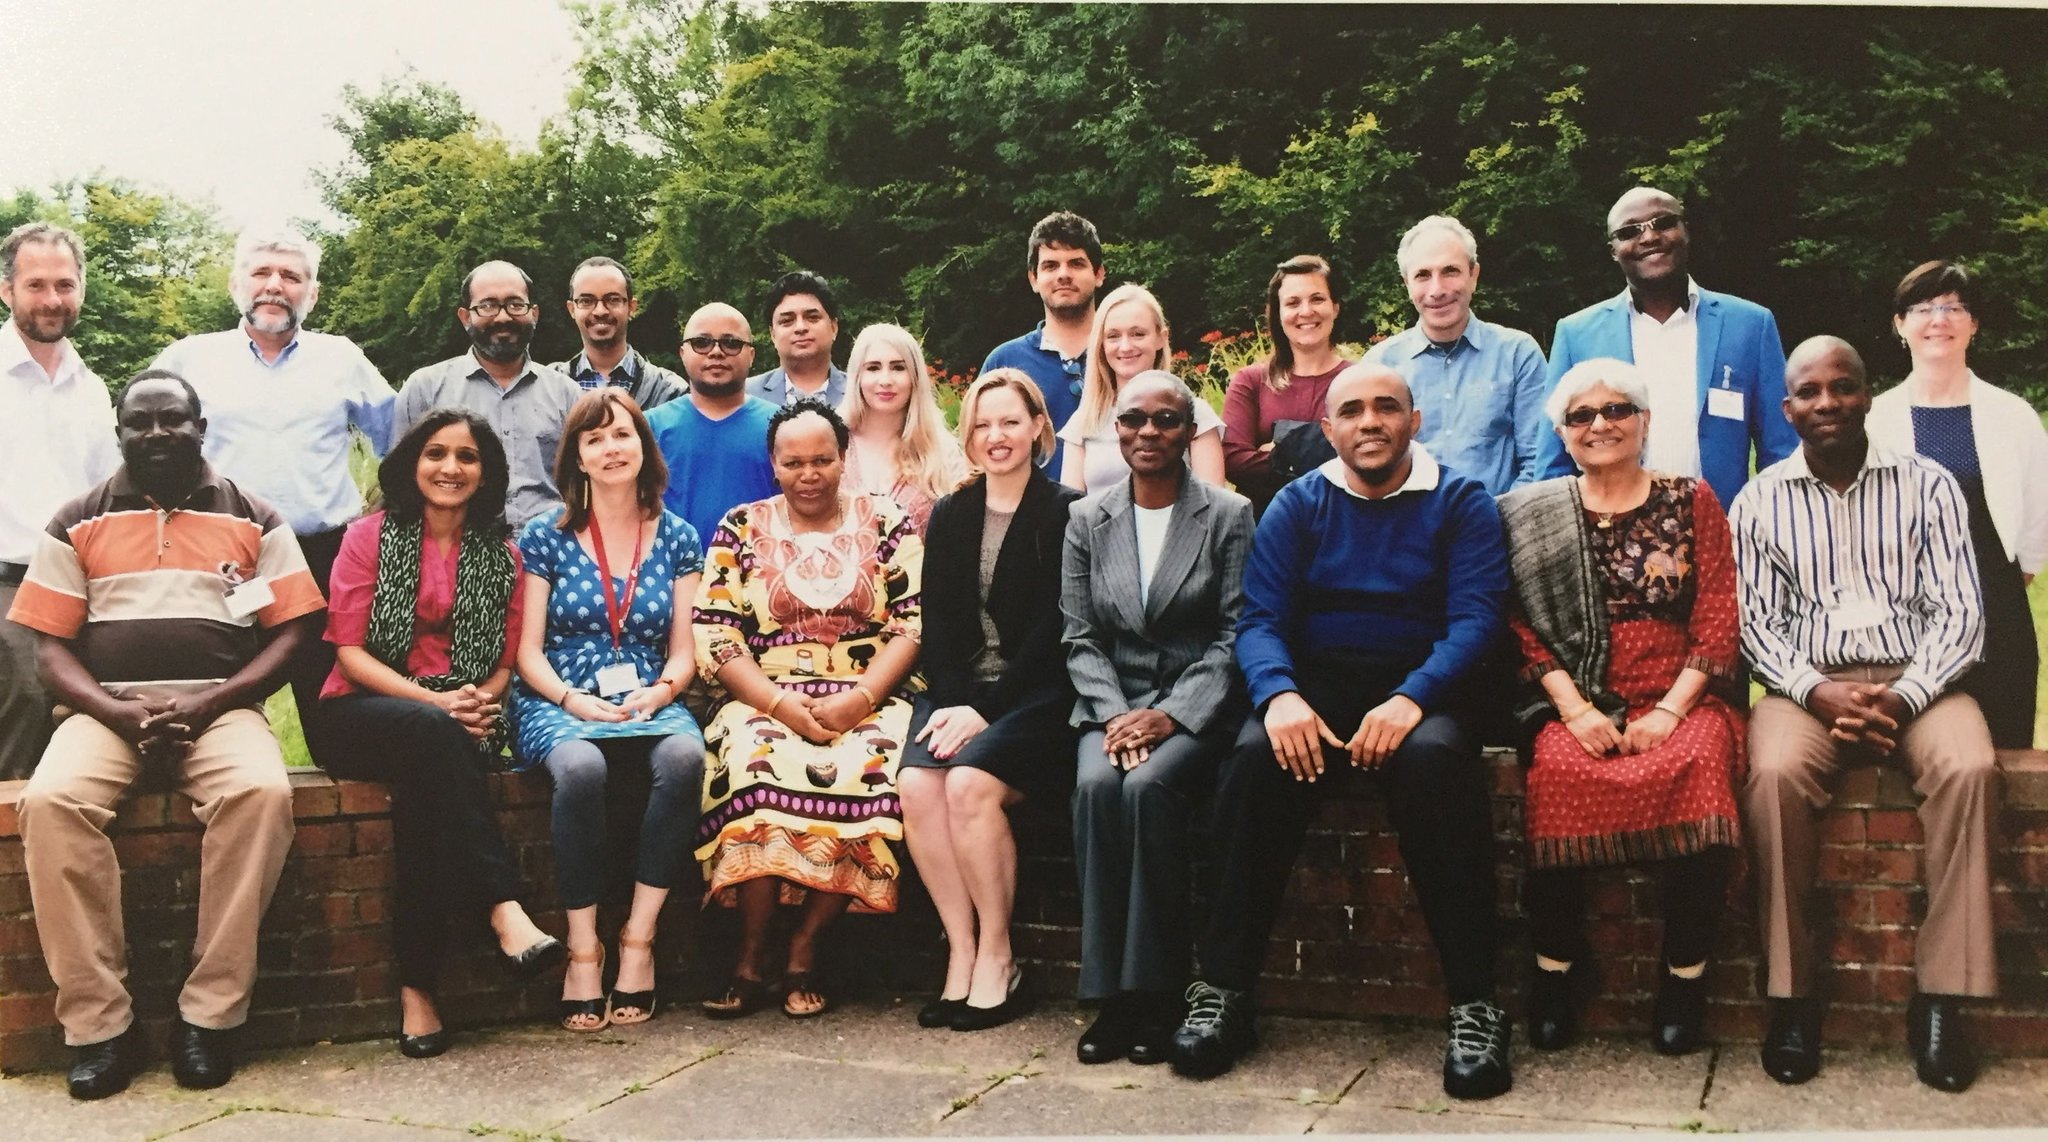 New blog: 3 quick reflections from @IDS_UK - @ifpri #nutrition course.  @TN_NutritionRPC  https://t.co/1WJ7U2lUgV https://t.co/LuasQRcd3F